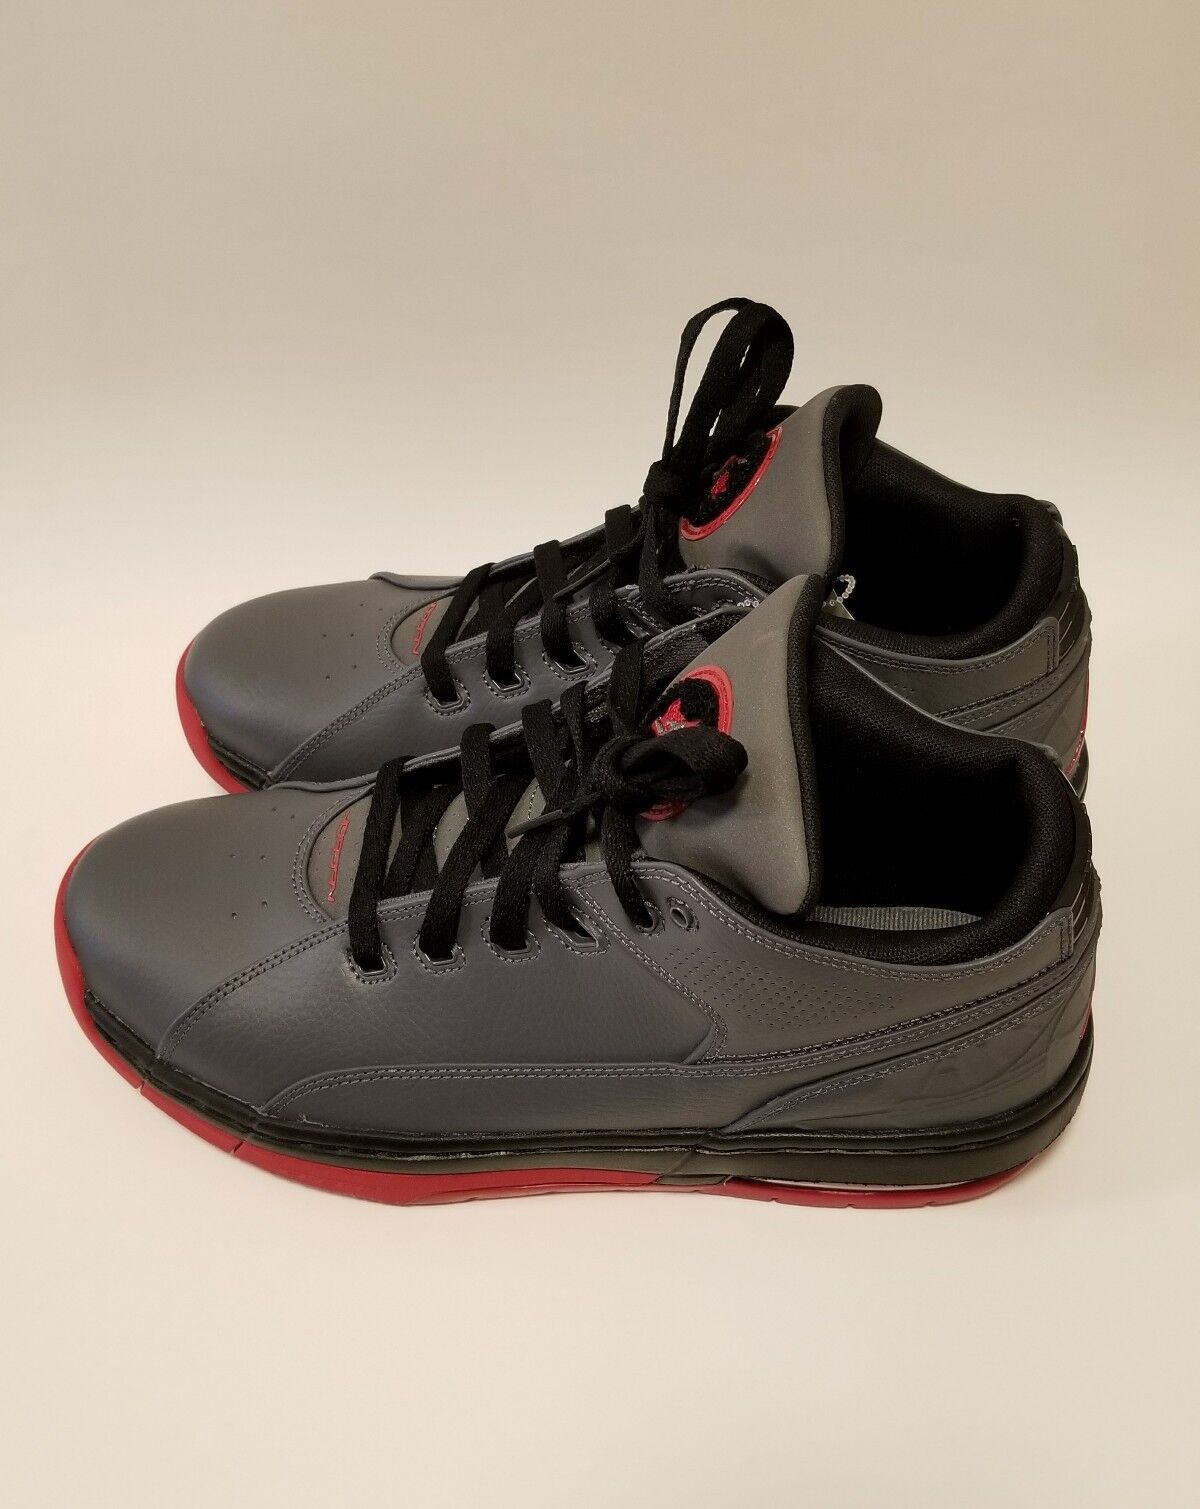 Jordan OL' School Low Men's Shoes Dark Grey/Gym Red-Black 317765-007 Comfortable Cheap women's shoes women's shoes